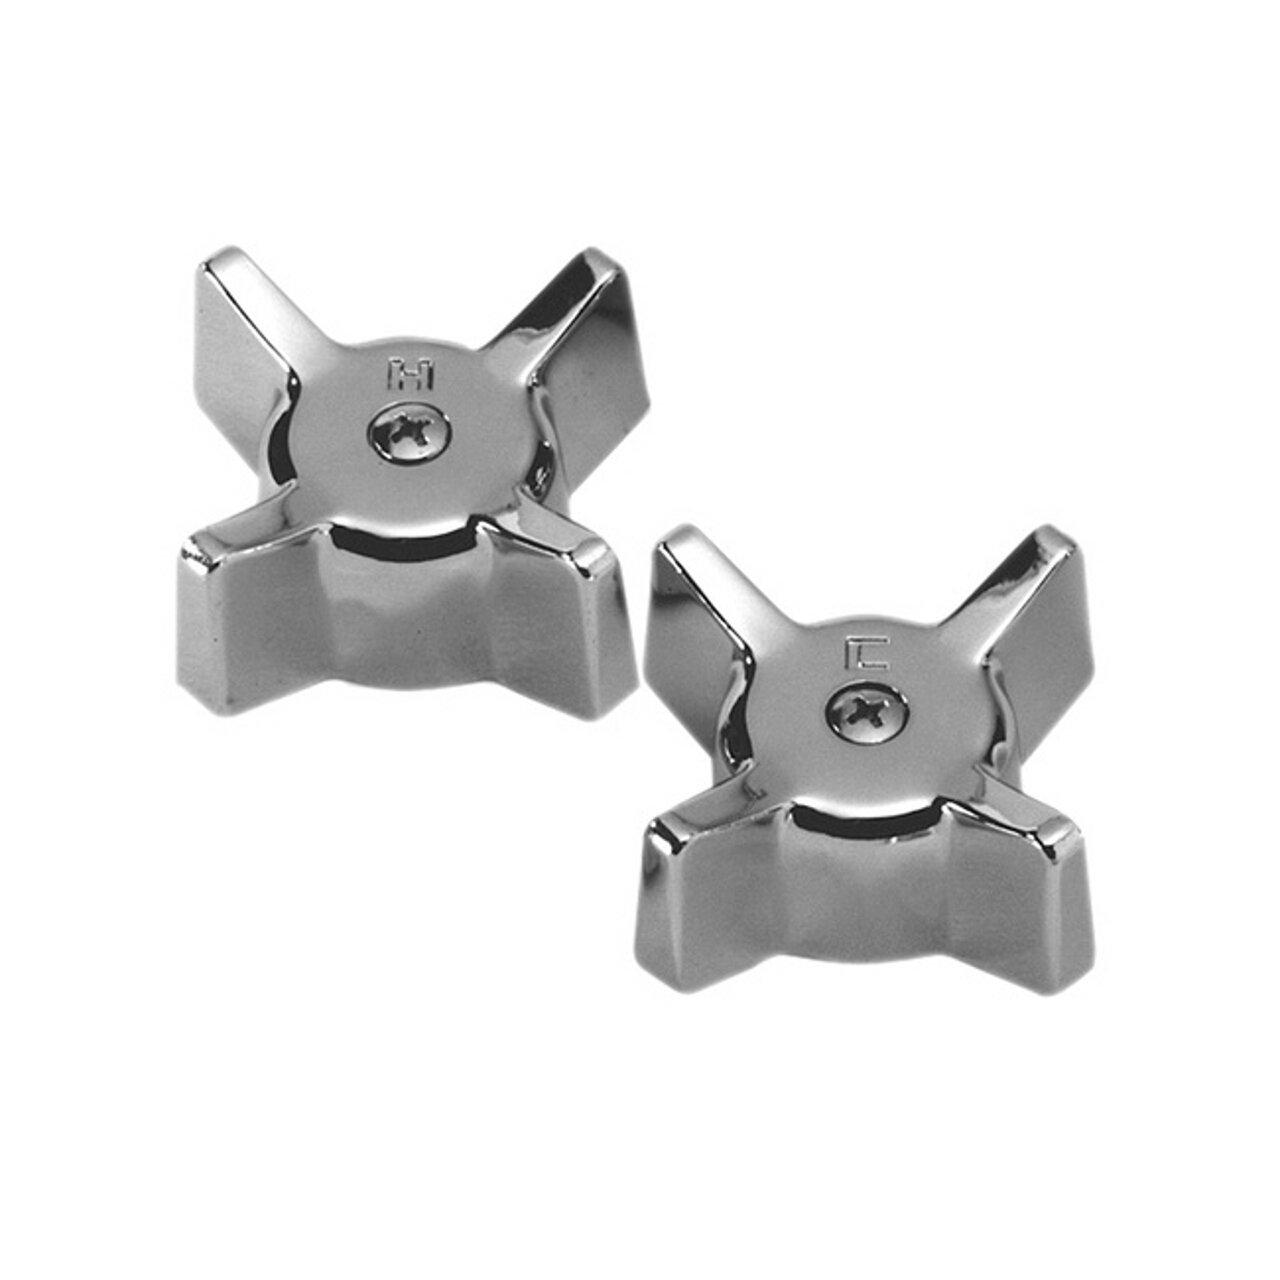 Danco 88090 Gerber Metal Cross Style Faucet Handle - - Amazon.com